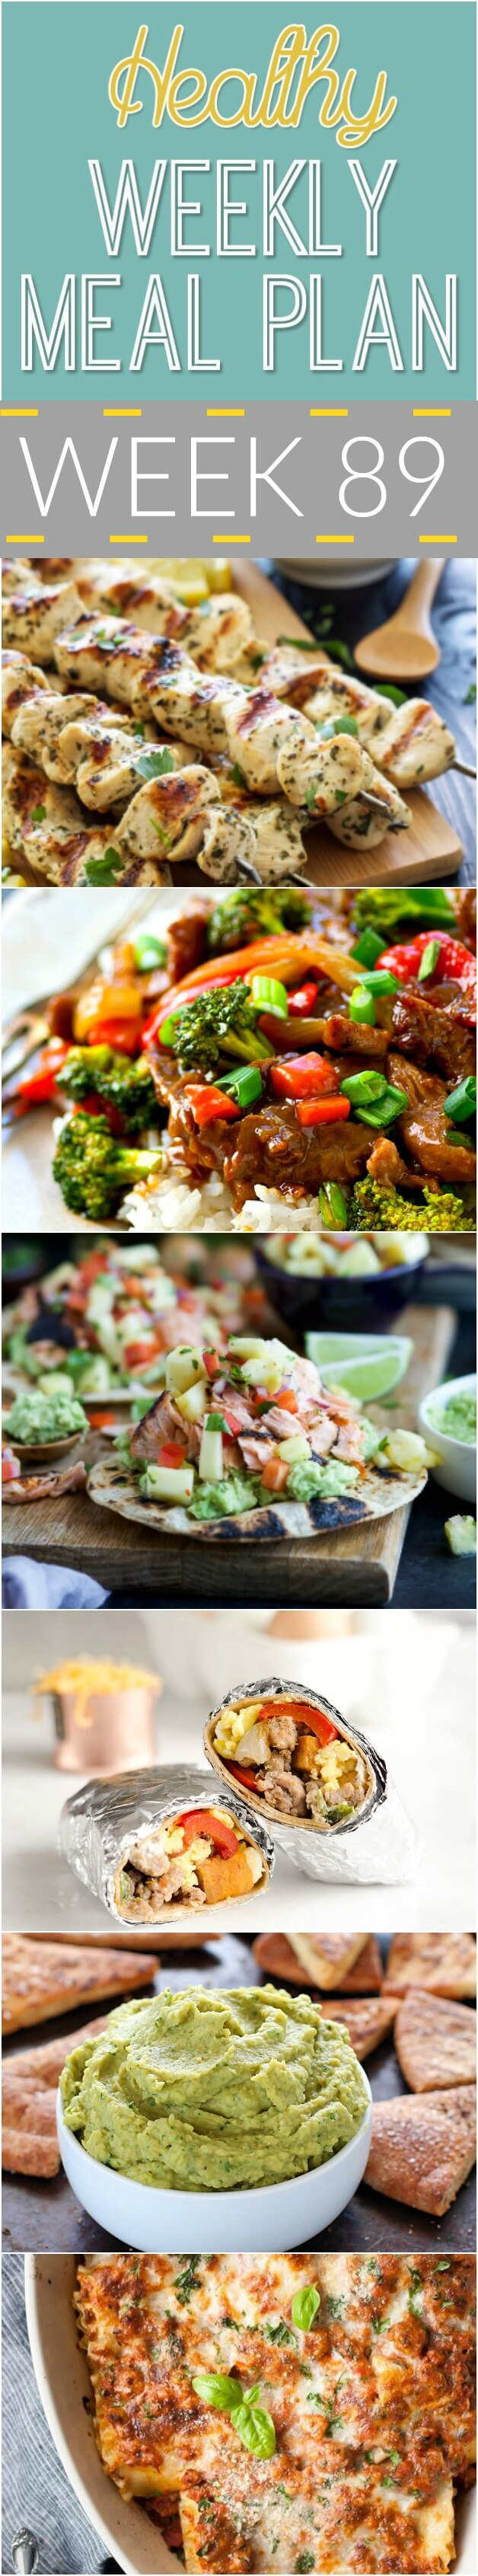 Healthy Weekly Meal Plan #89